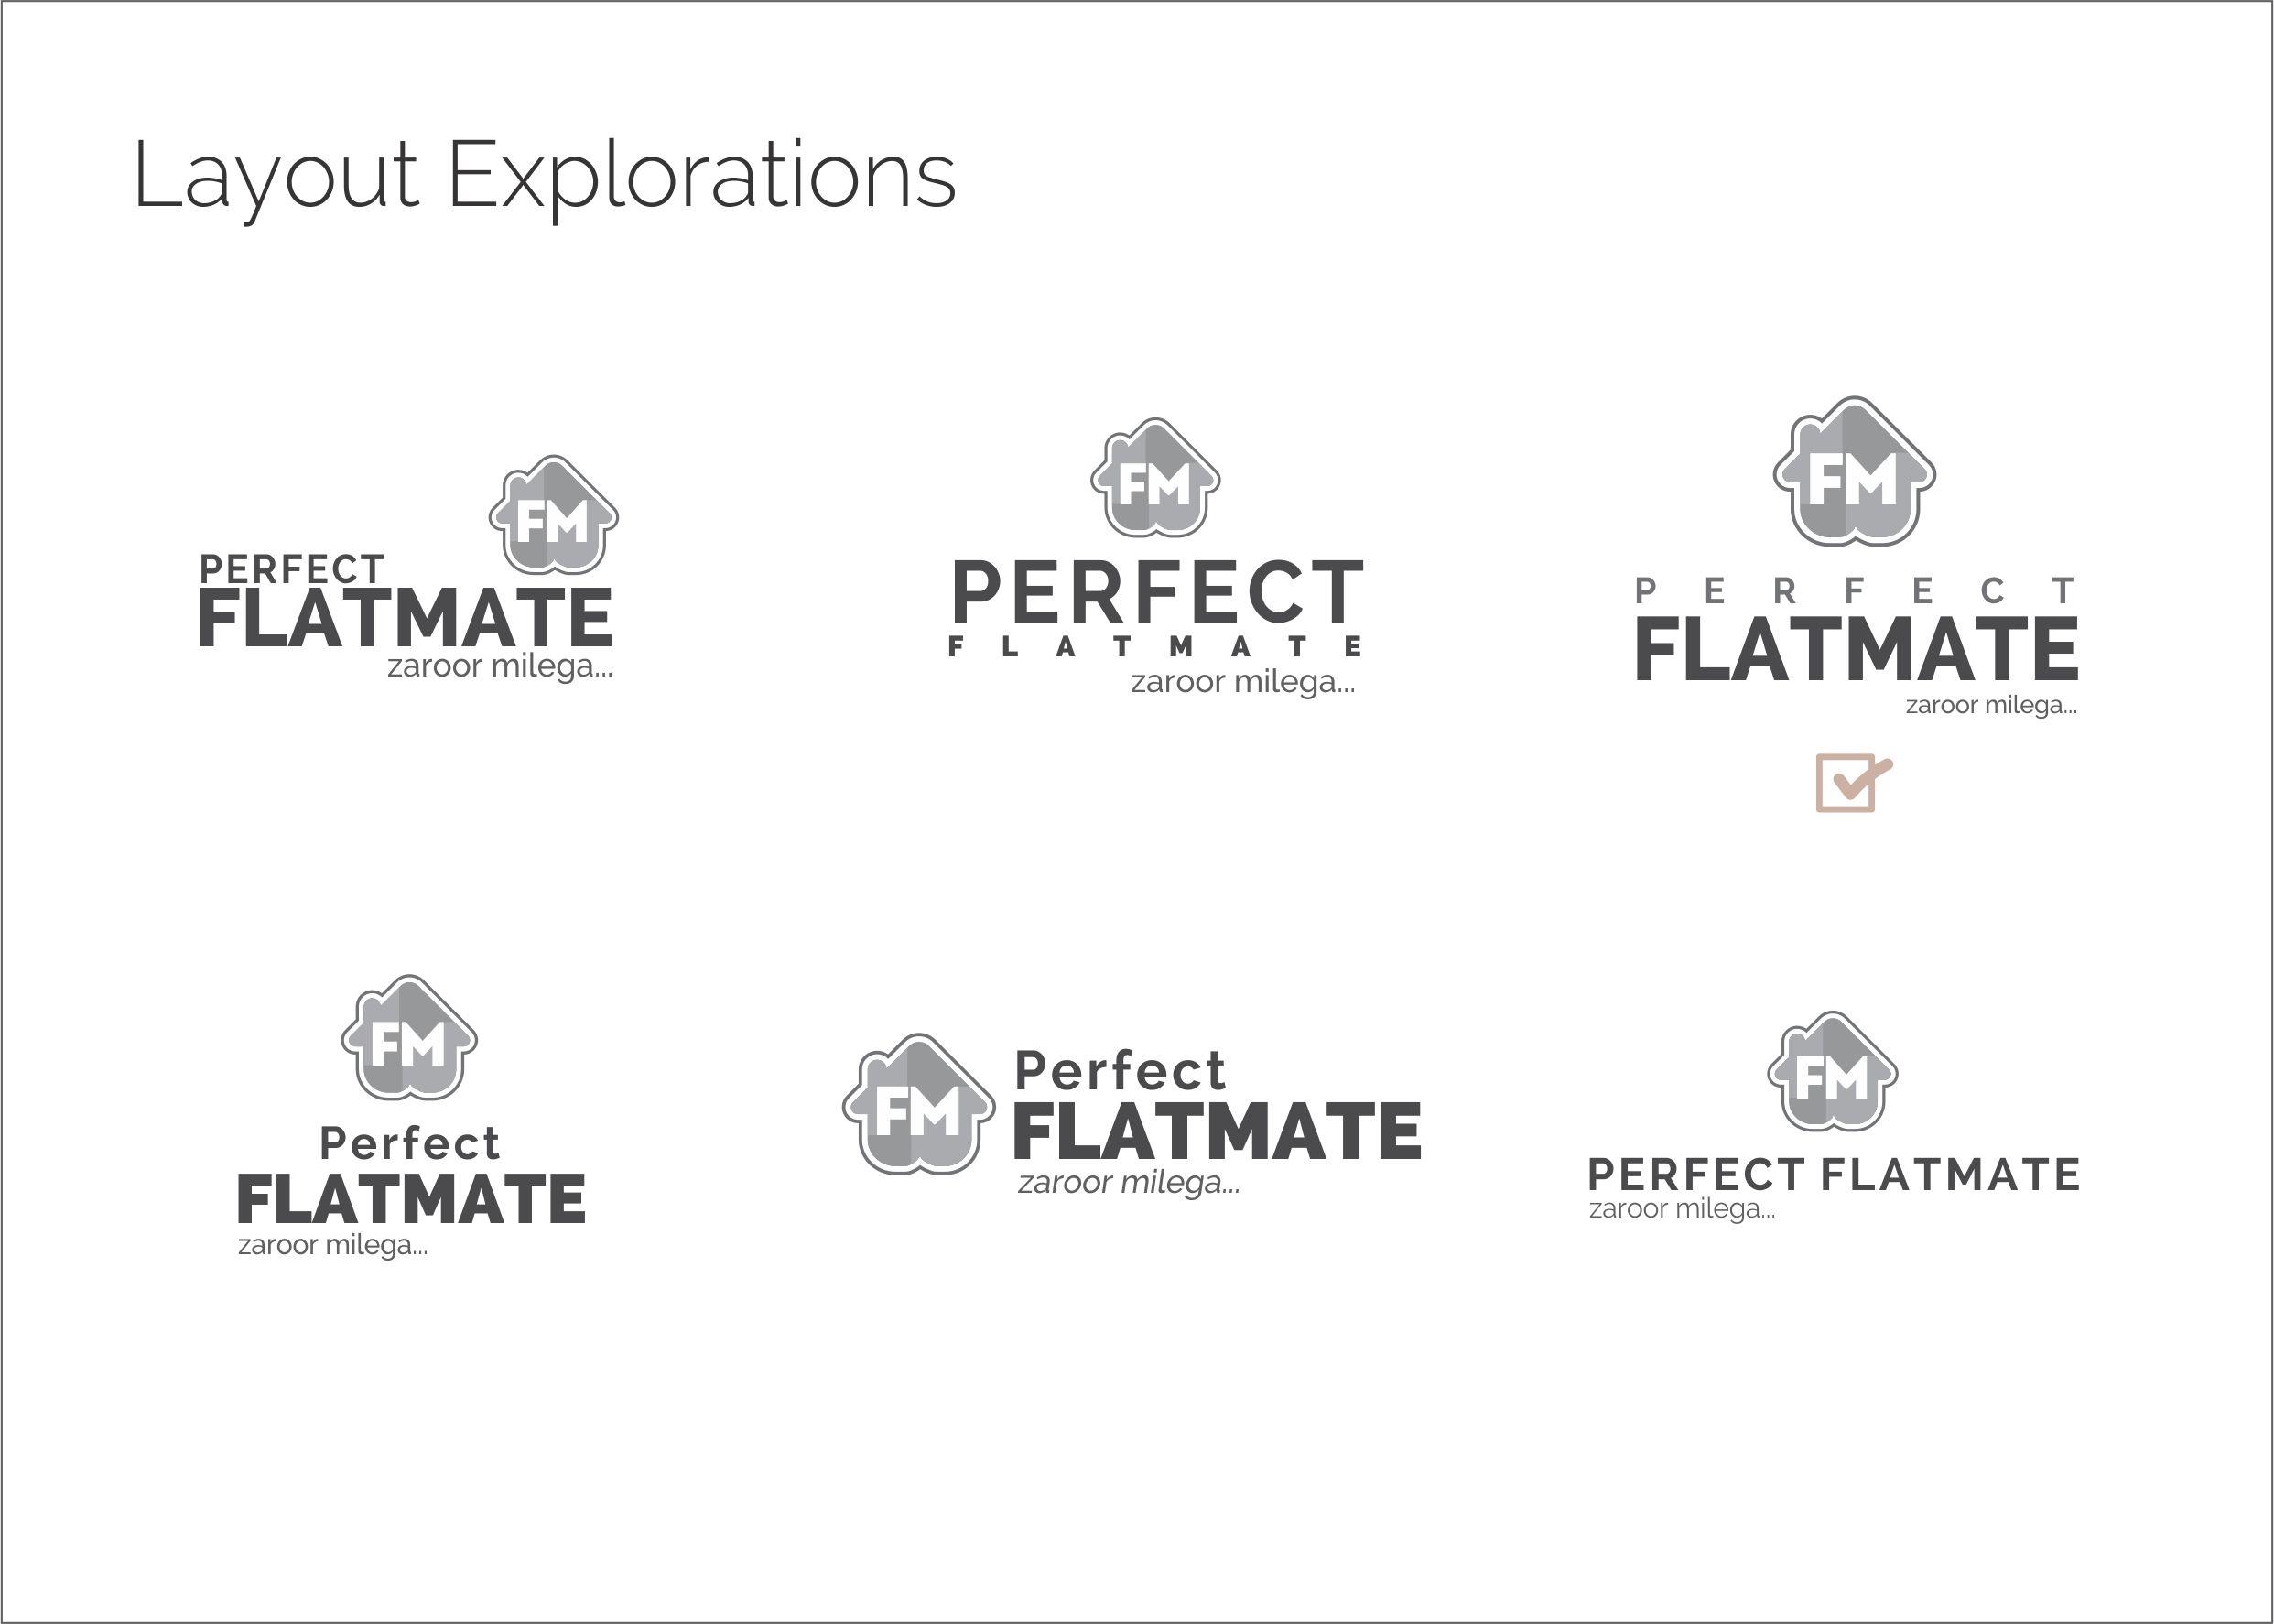 Layout Explorations of logo design